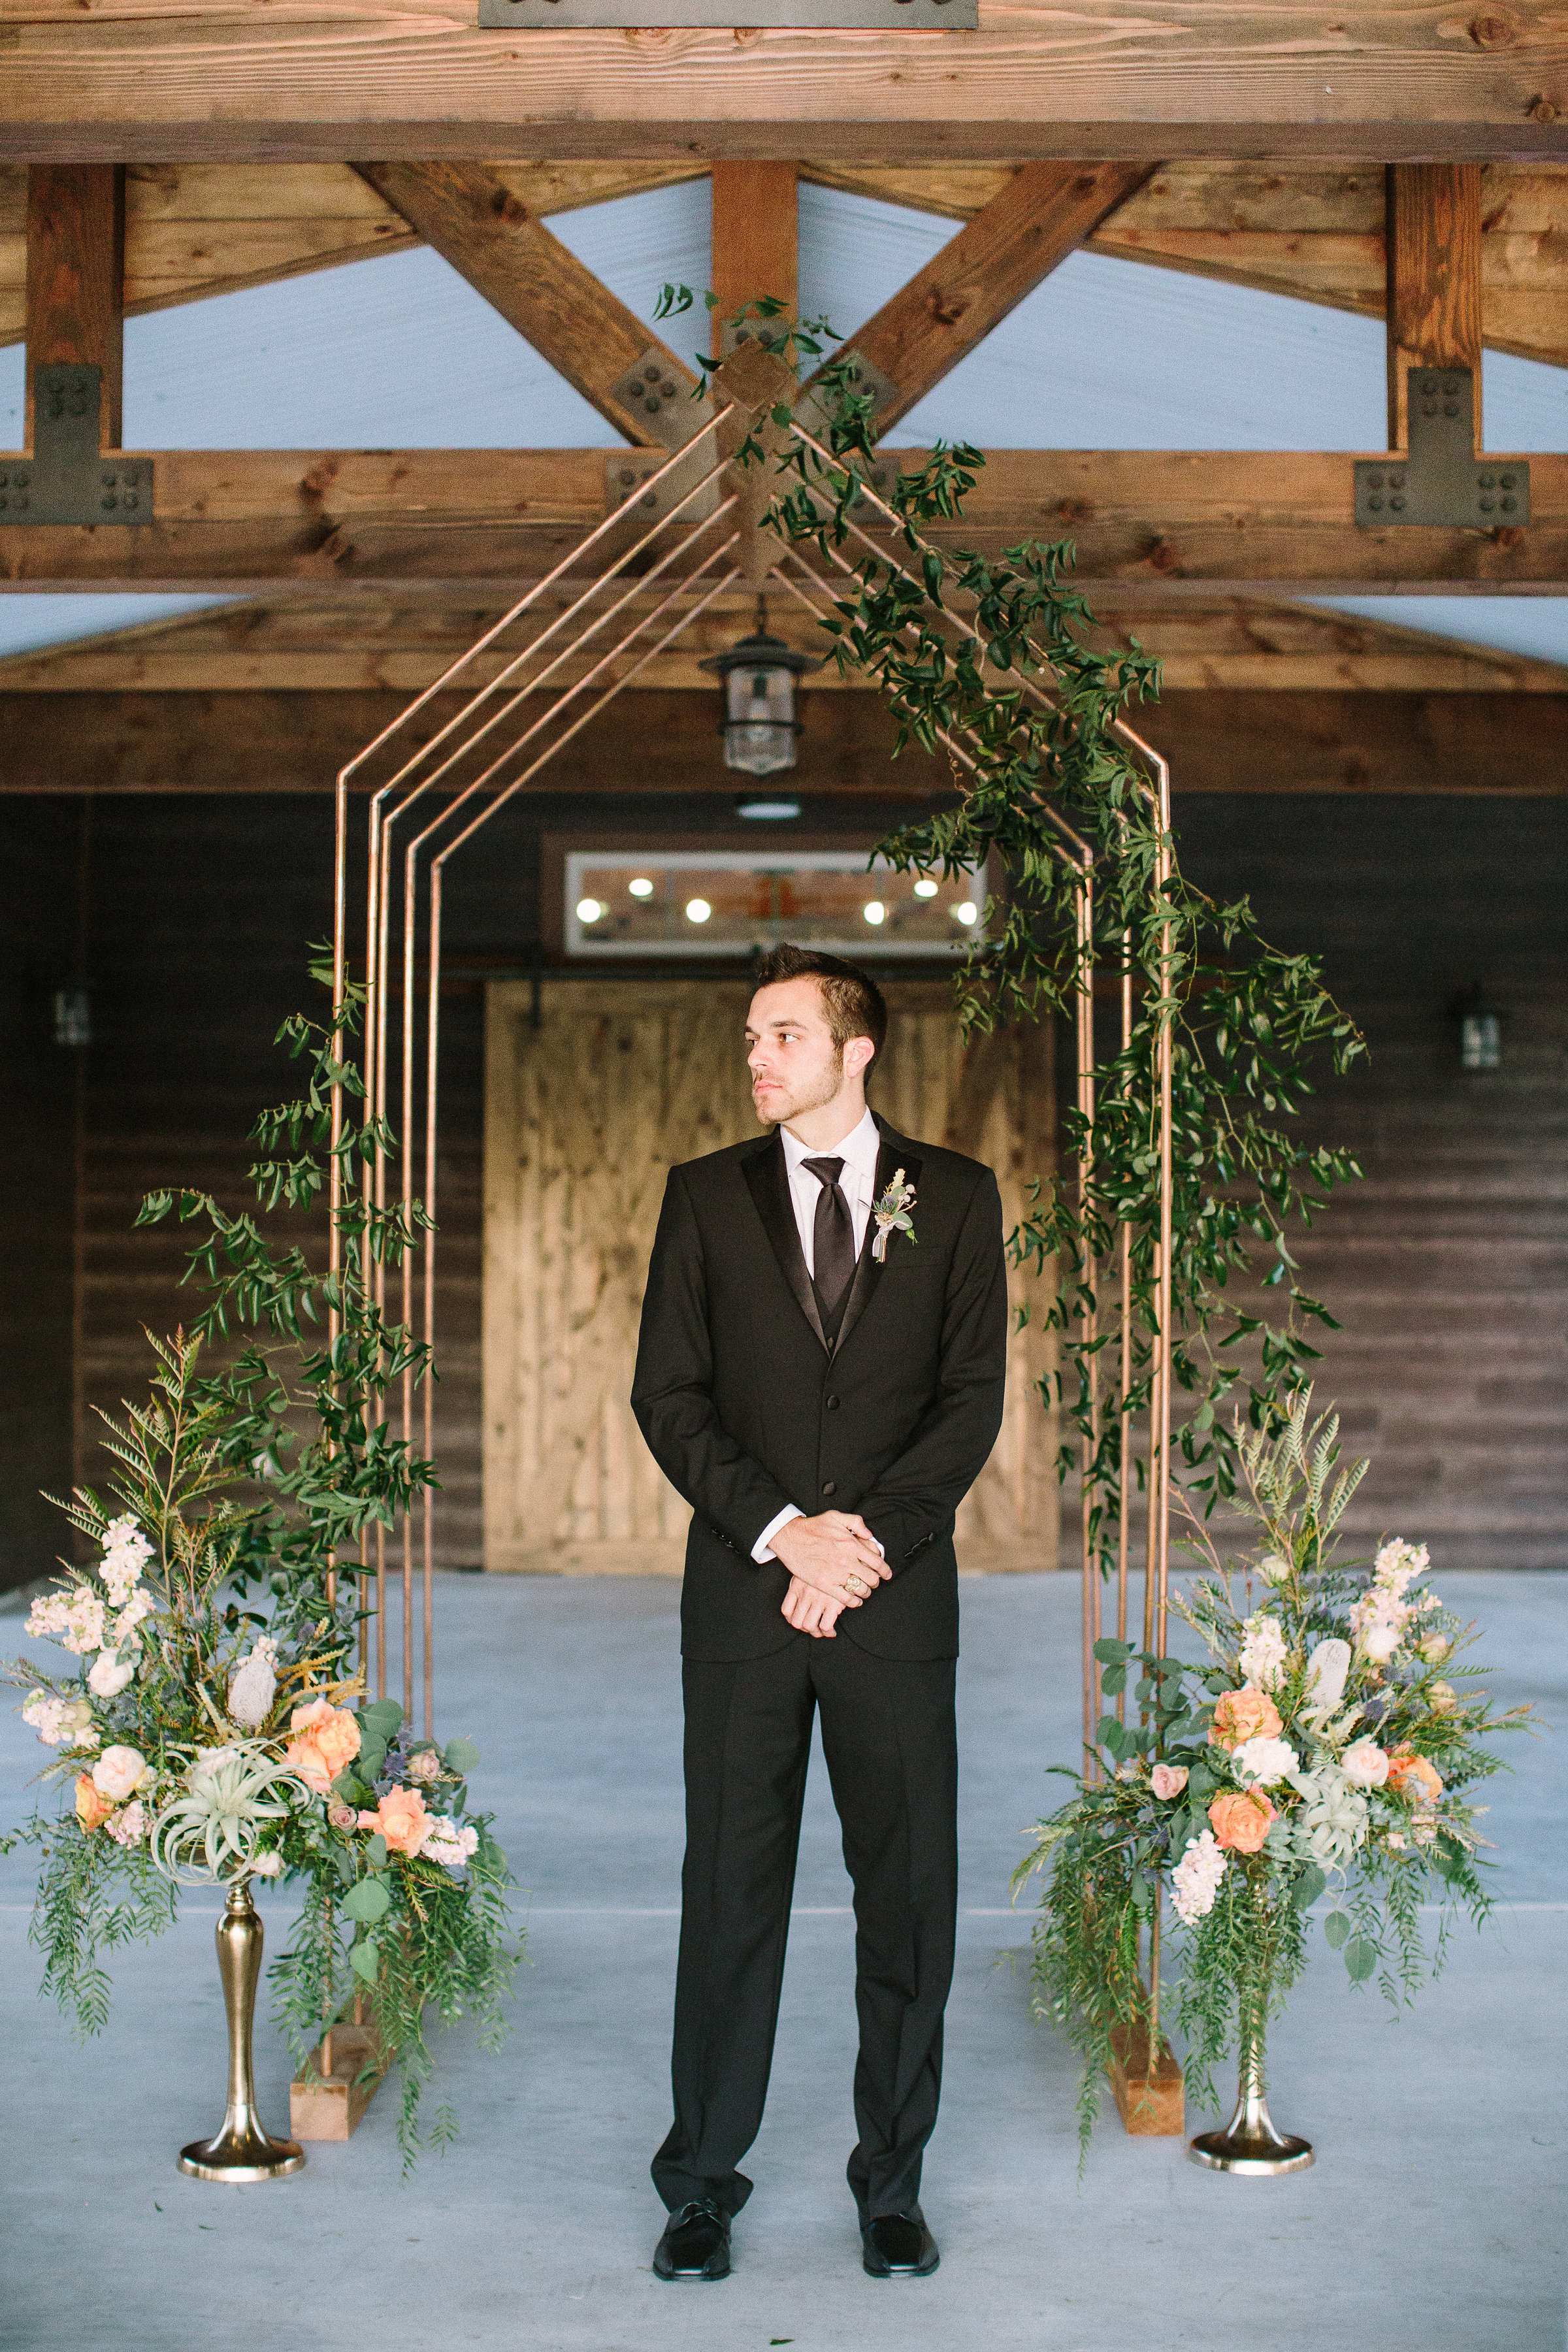 Ellen-Ashton-Photography-Peach-Creek-Ranch-Weddings-Wed-and-Prosper369